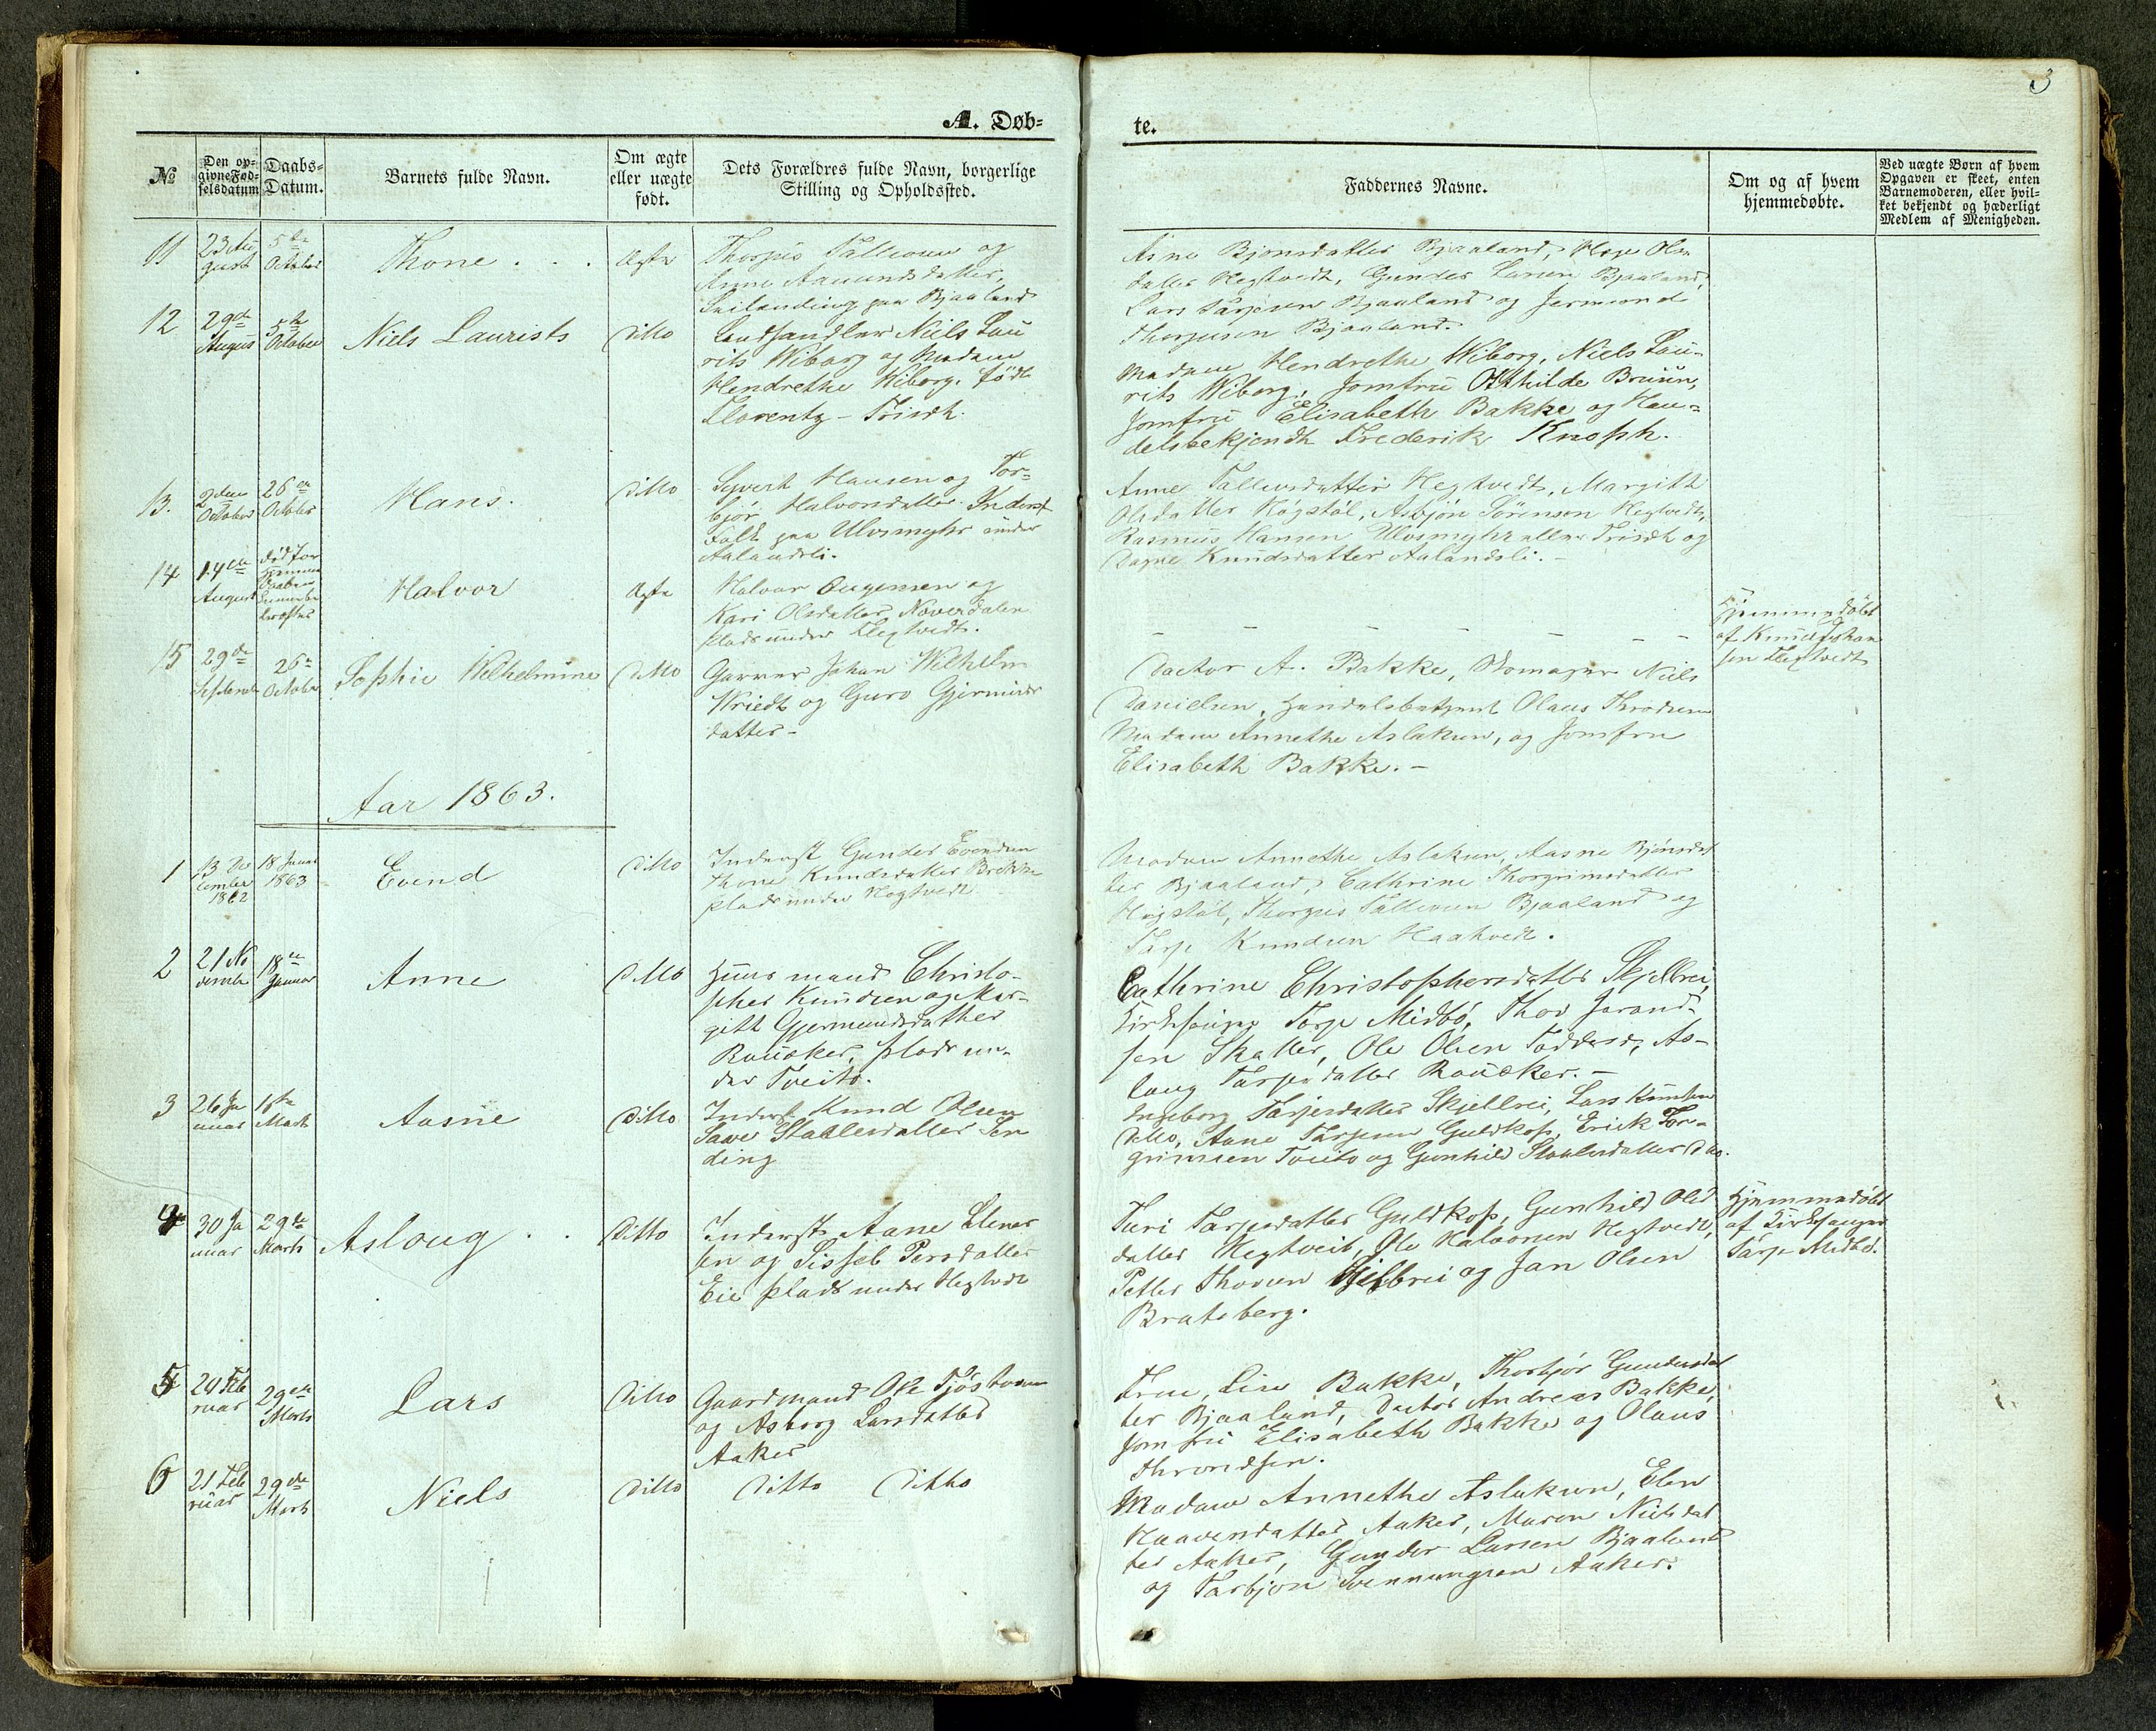 SAKO, Lårdal kirkebøker, G/Ga/L0002: Klokkerbok nr. I 2, 1861-1890, s. 3